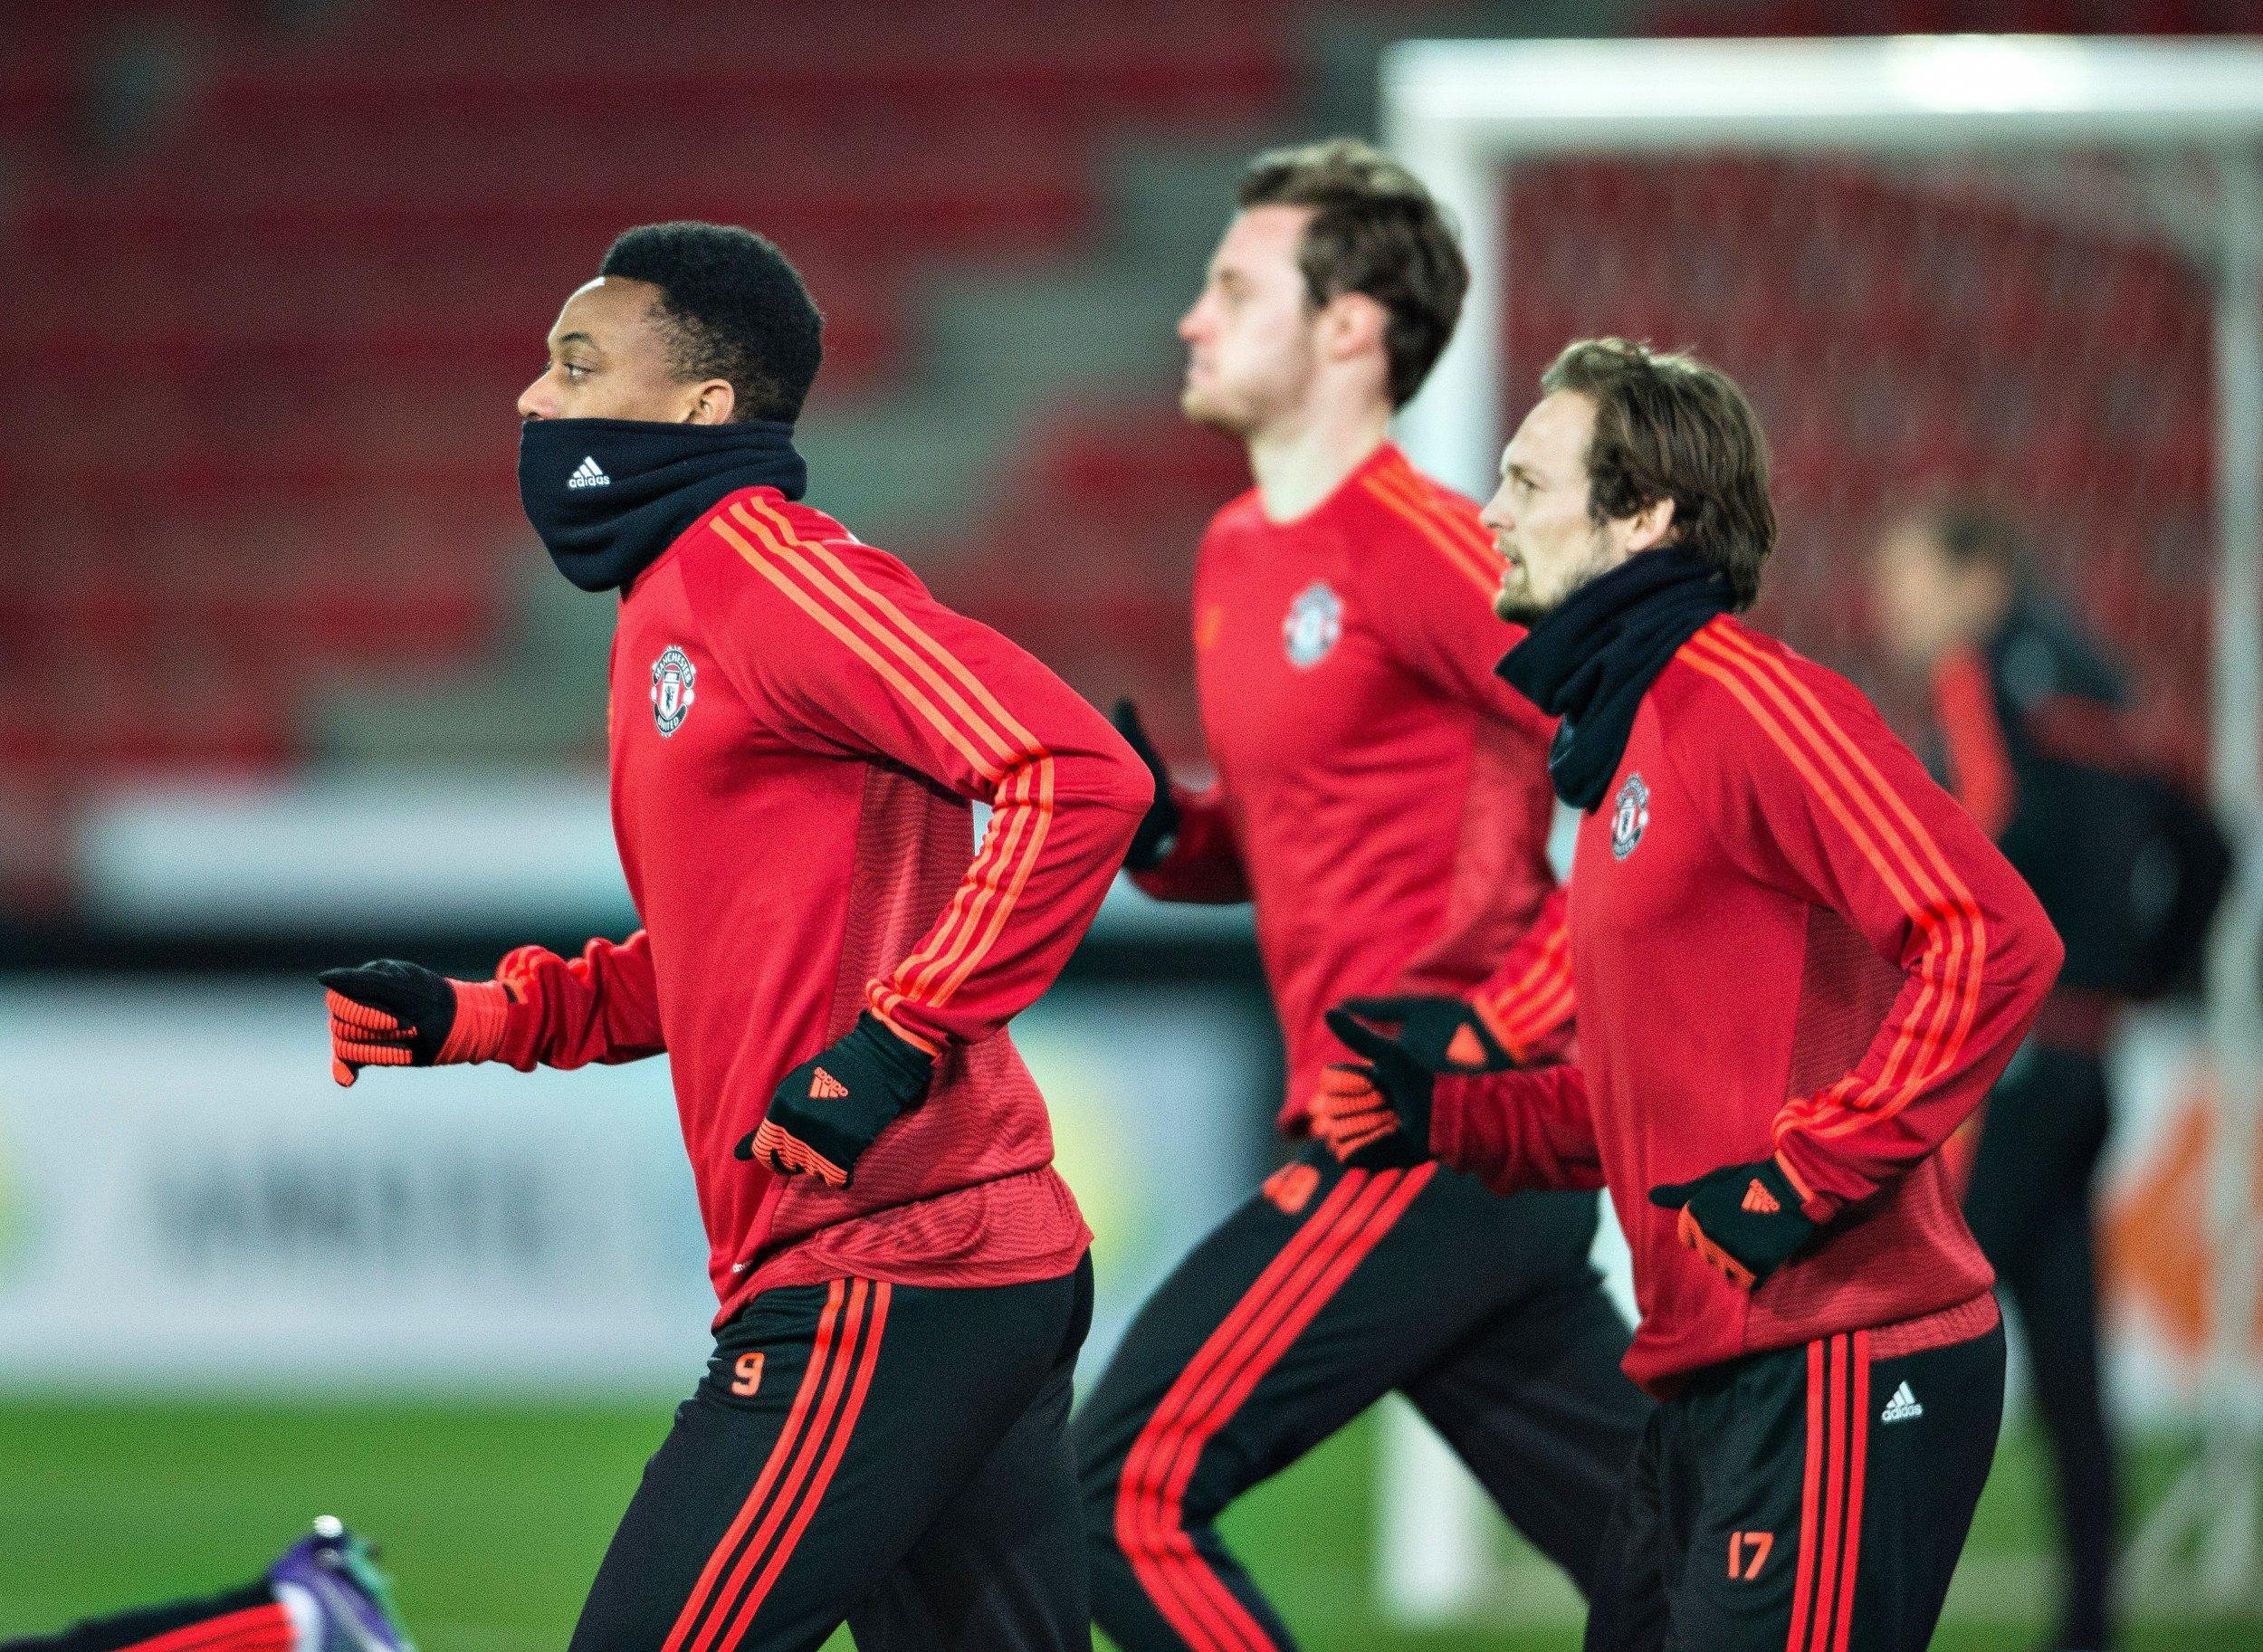 Manchester United plays FC Midtjylland on Thursday night in Herning, Denmark.